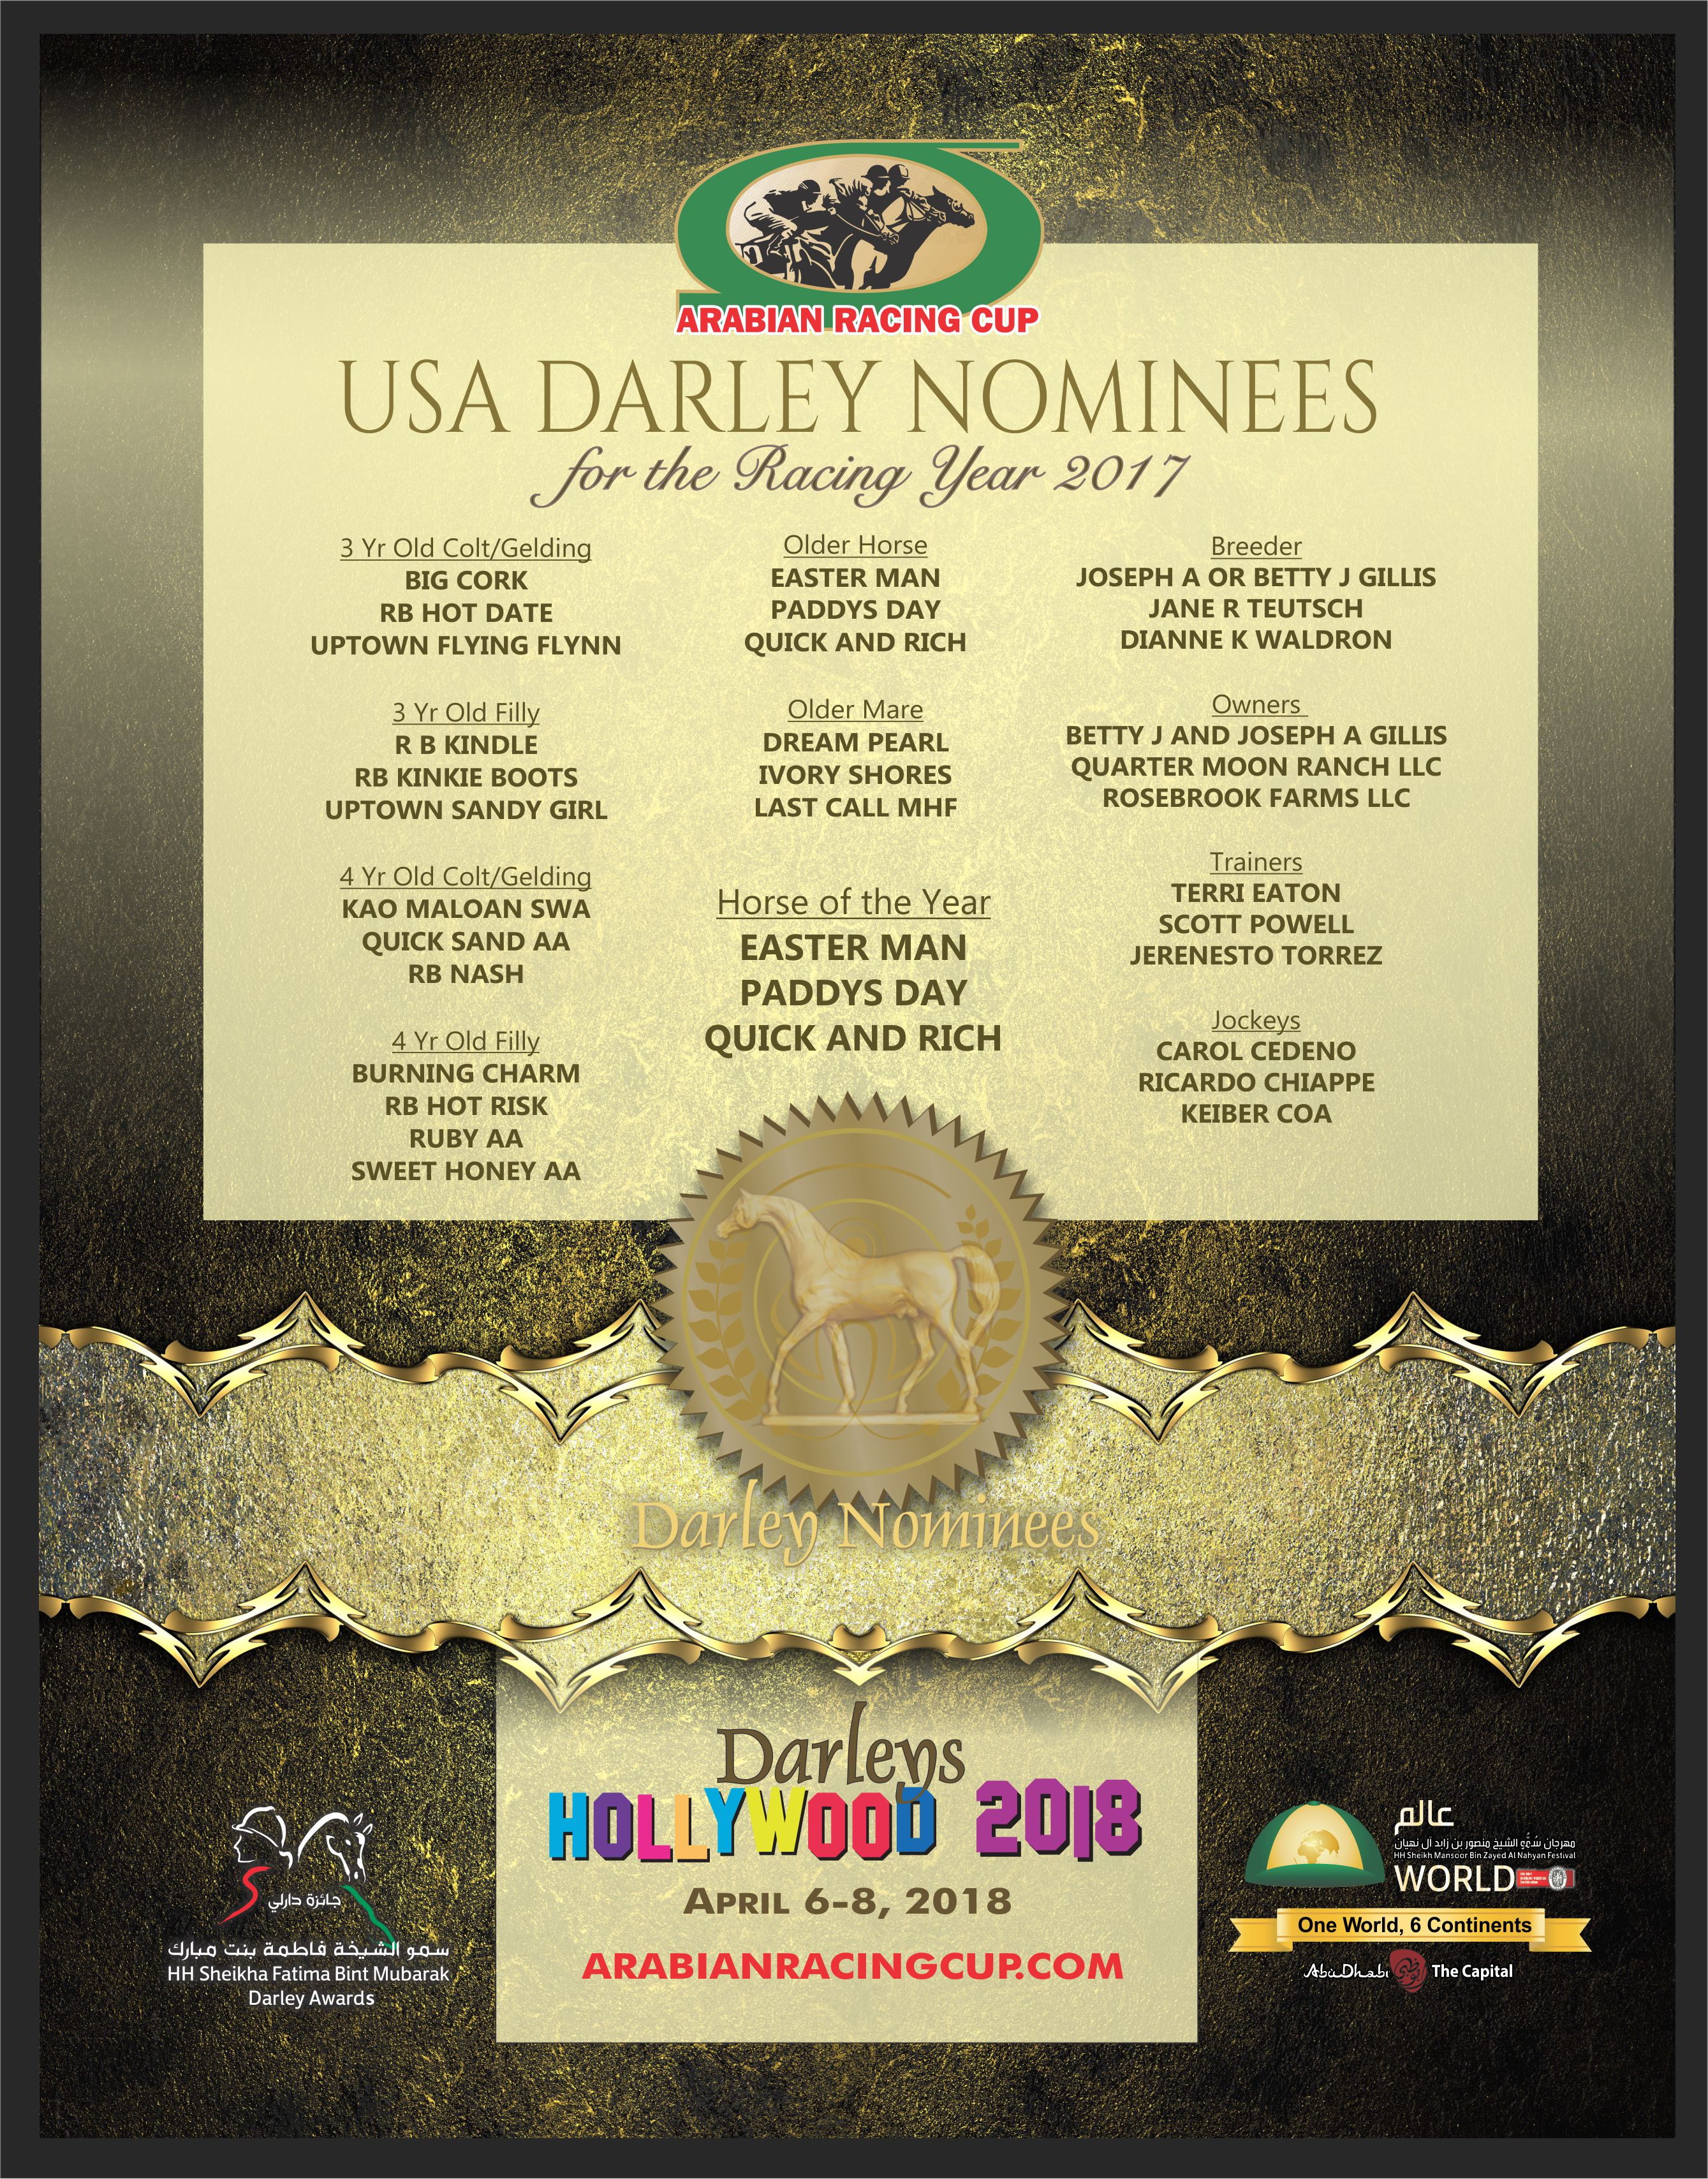 Darley Awards 2018